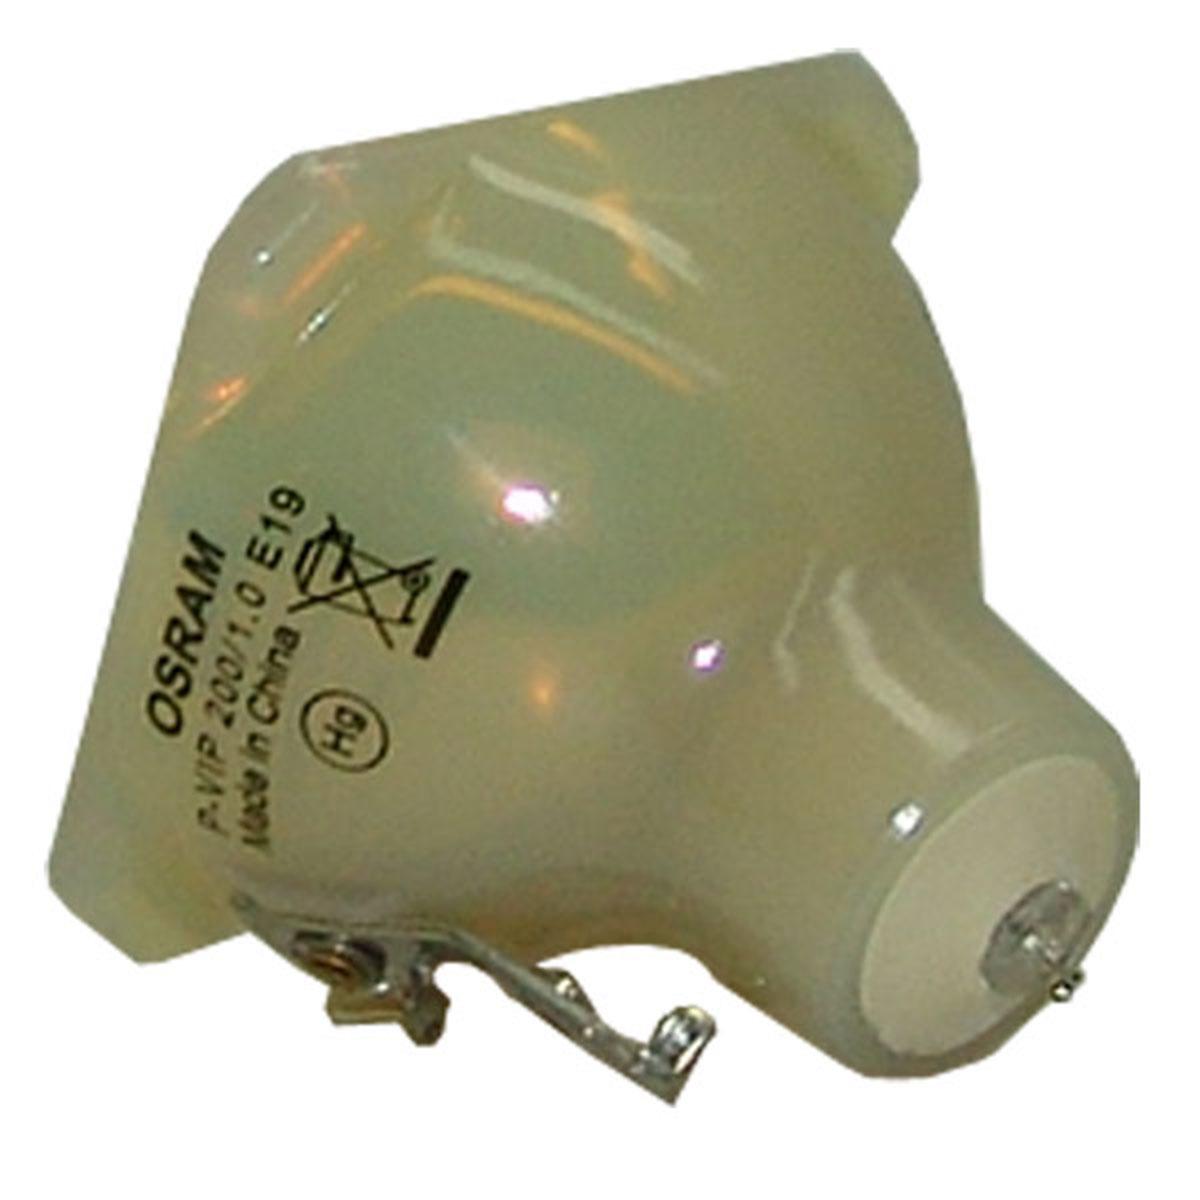 Original Osram Projector Lamp Replacement for Delta DP3616LAMP (Bulb Only) - image 4 de 5